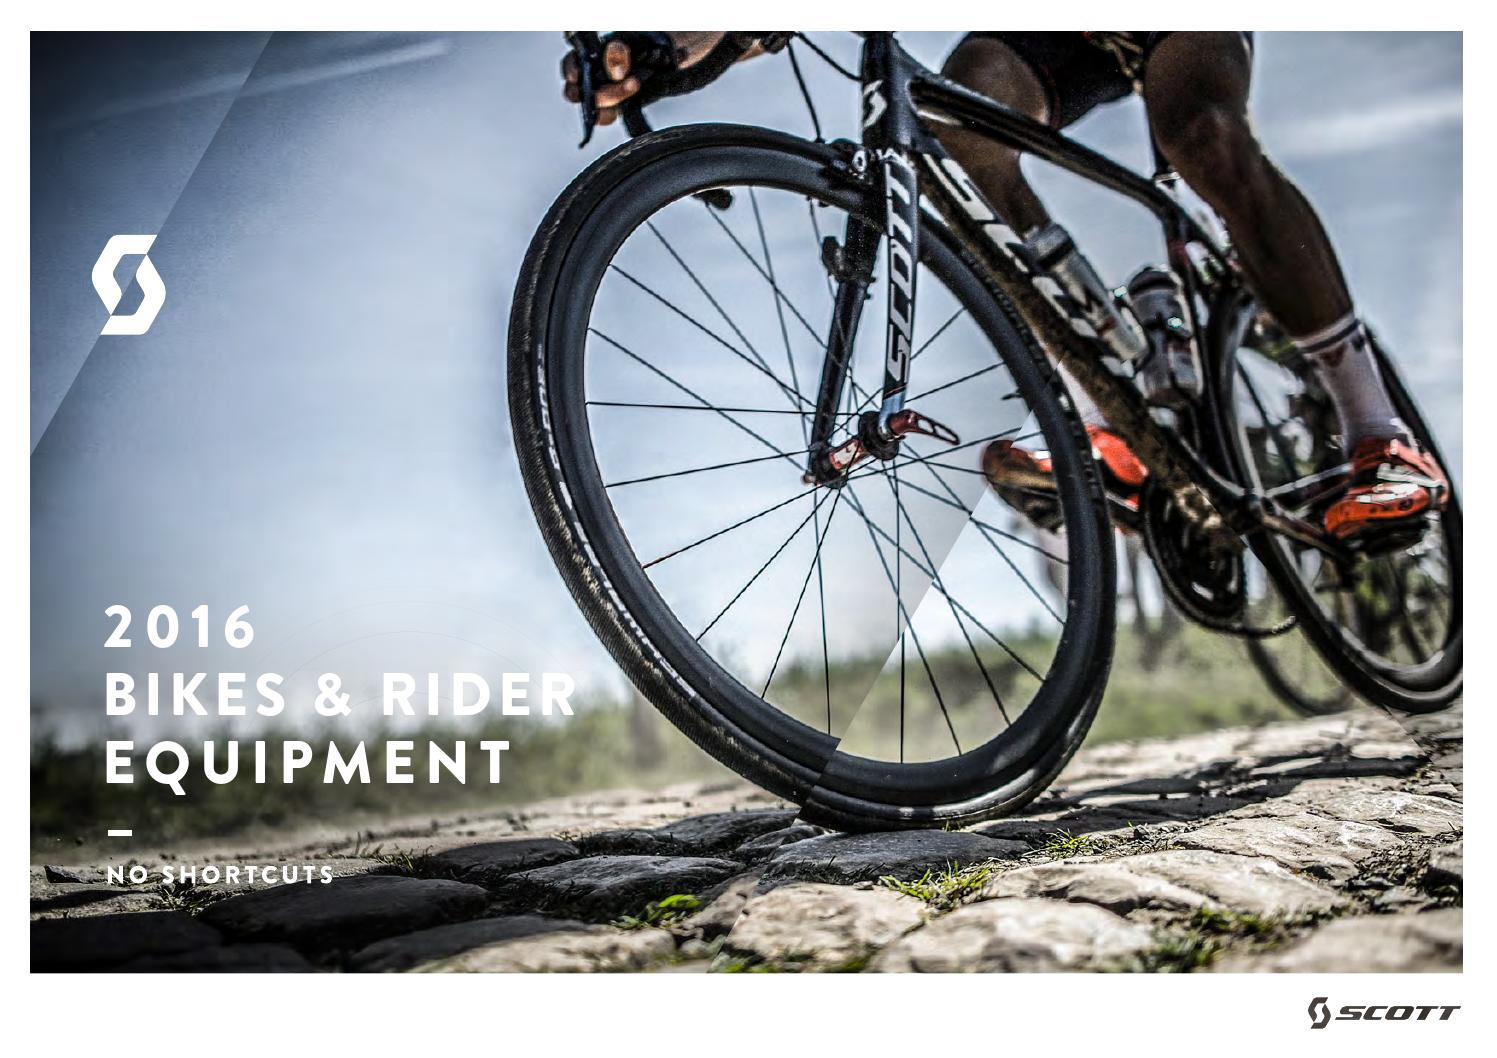 2016 bike consumer catalogue a4 de iss by SCOTT Sports SA - issuu